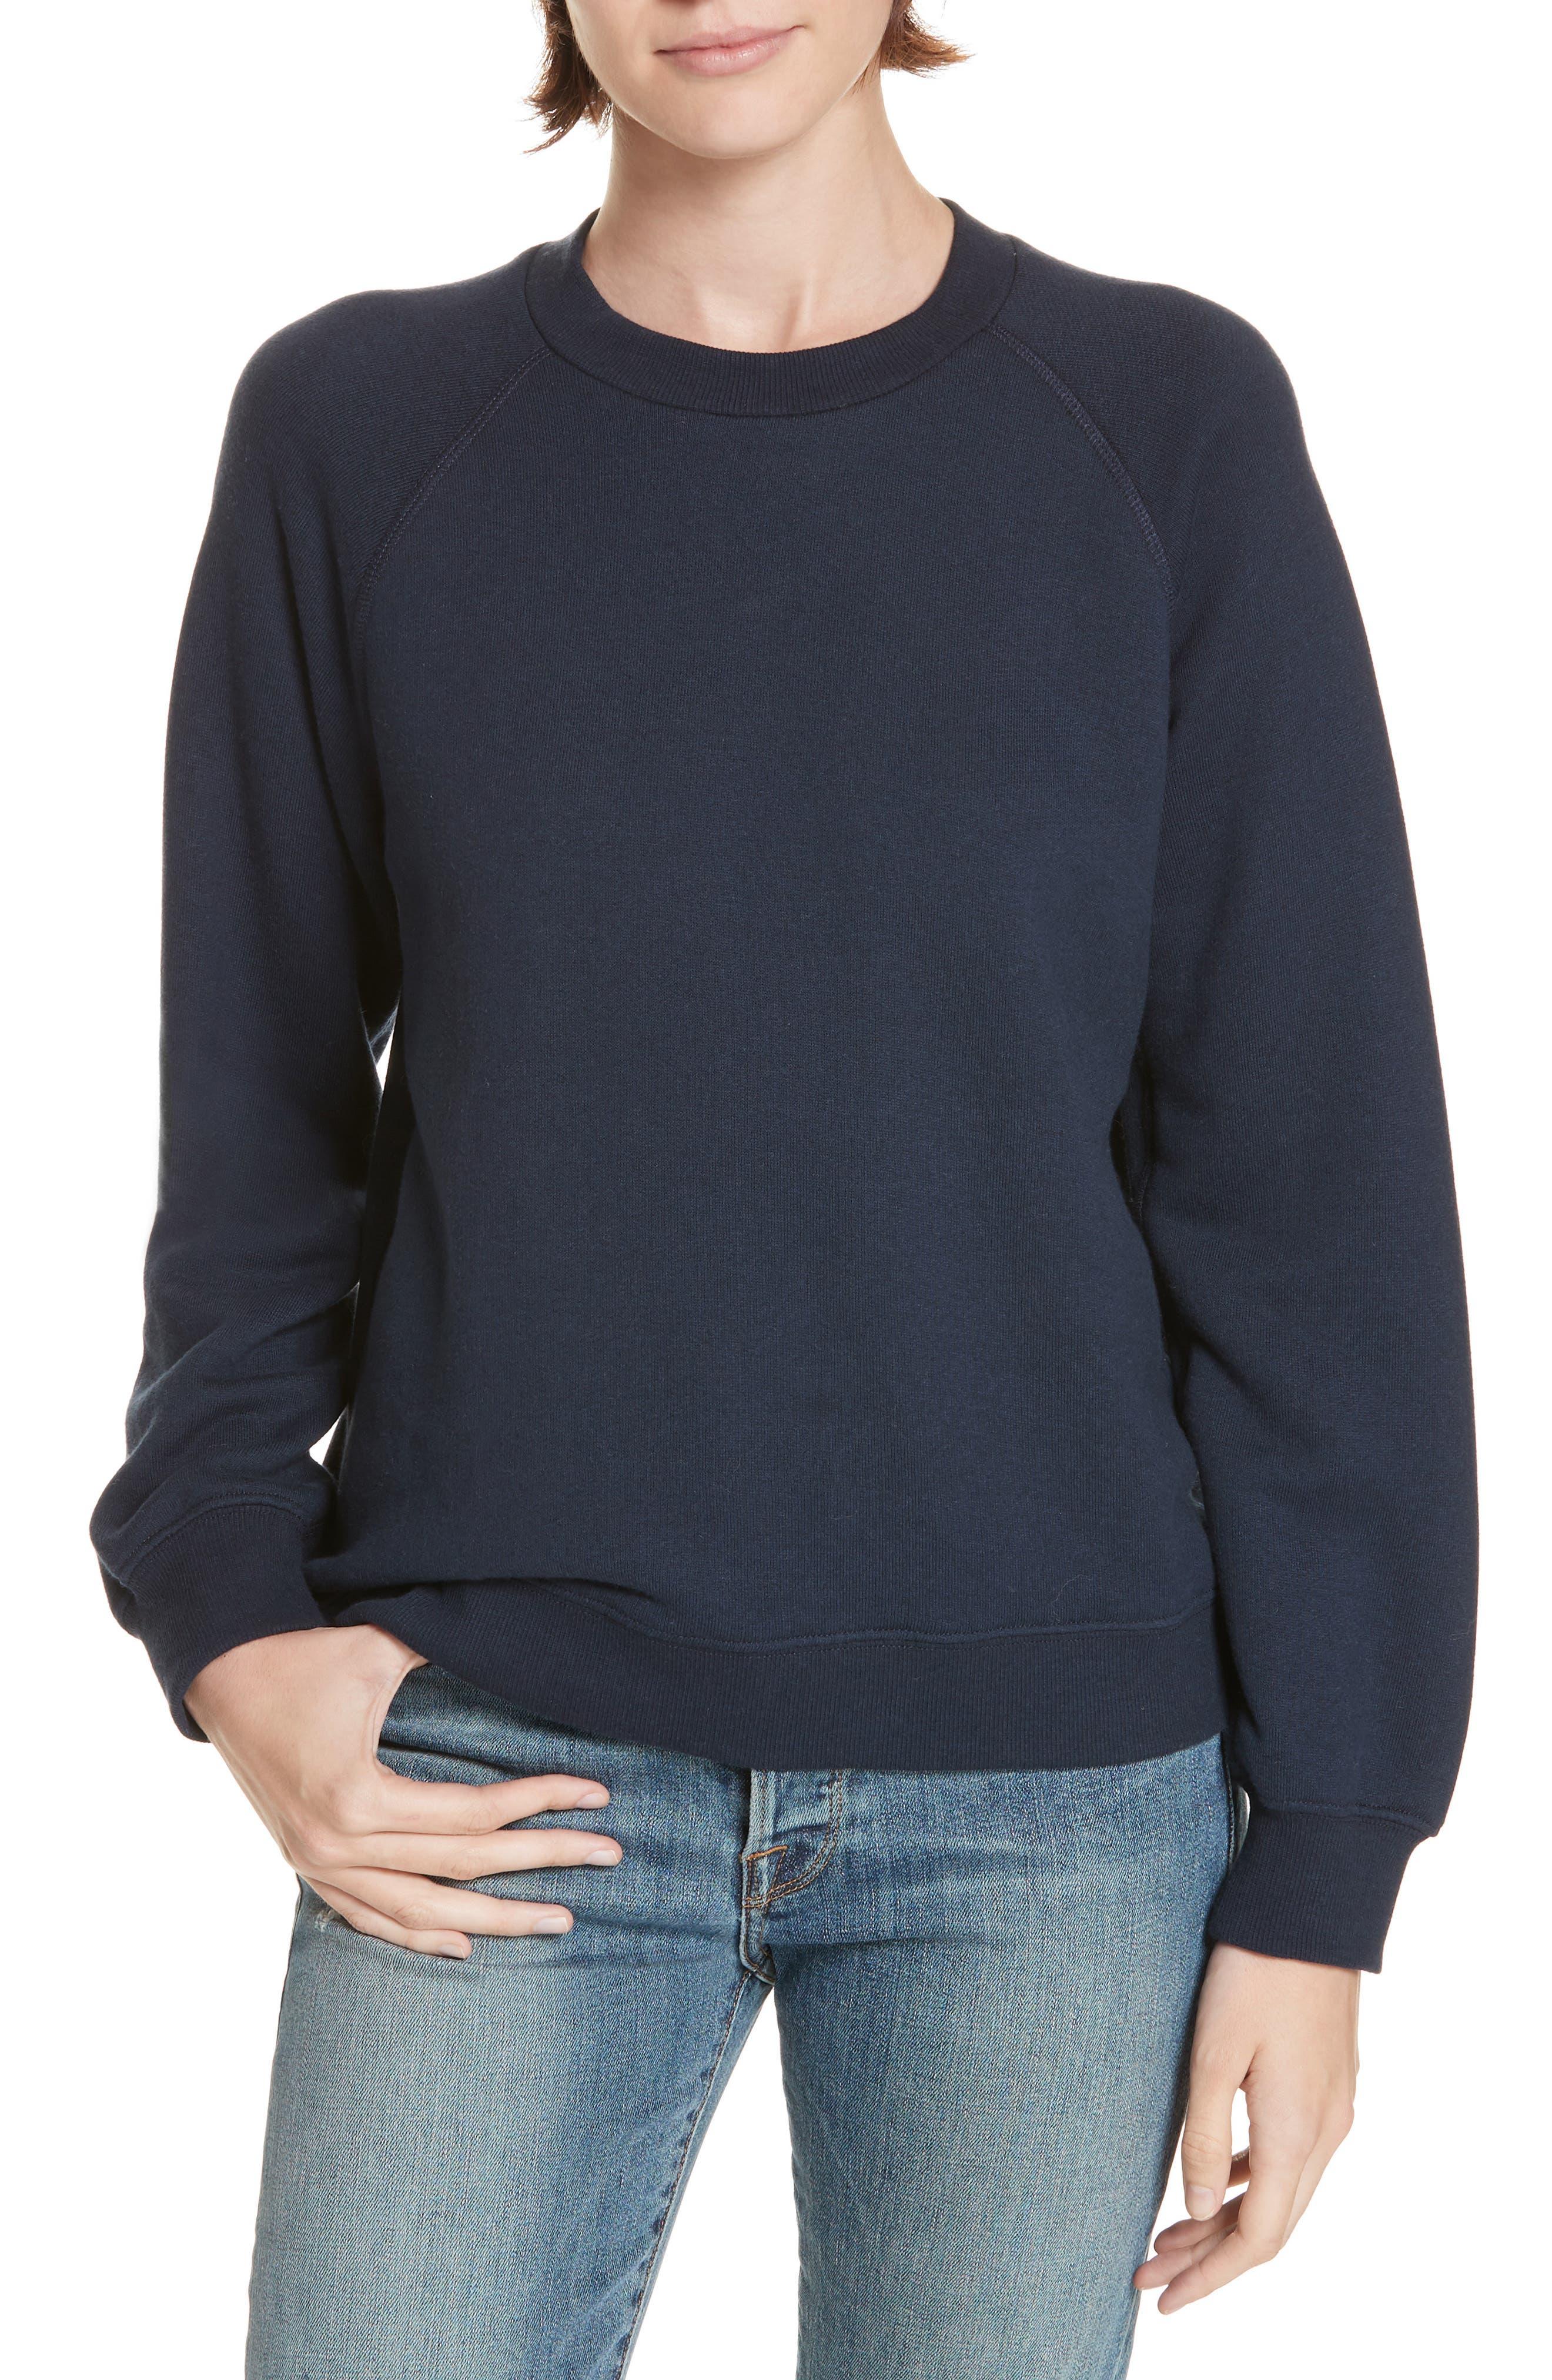 JENNI KAYNE Sweatshirt in Navy